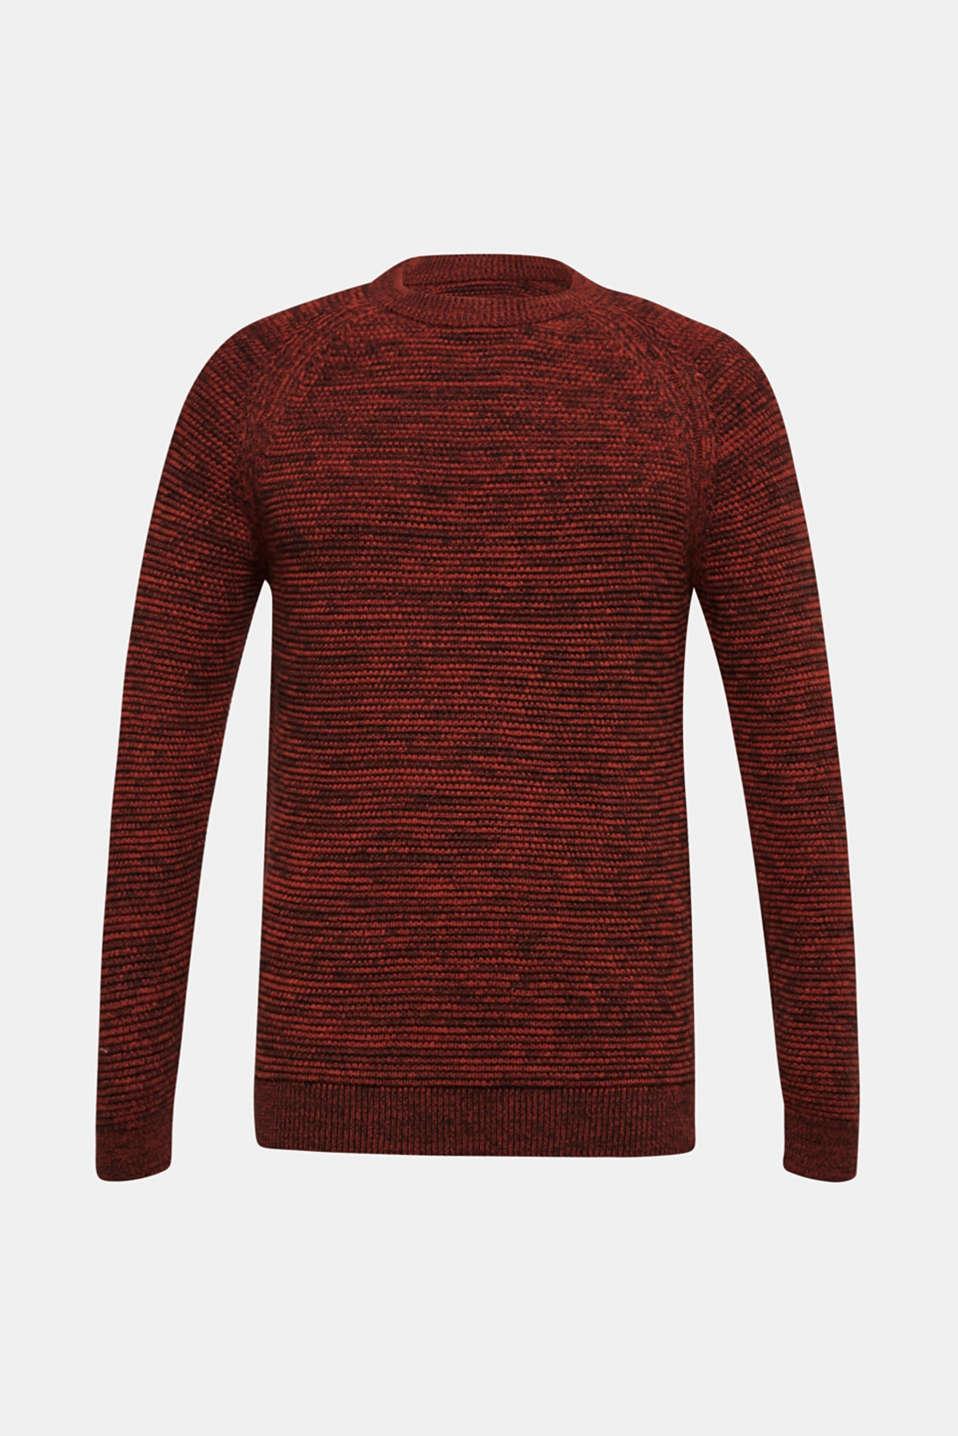 Sweaters, RUST ORANGE 5, detail image number 7